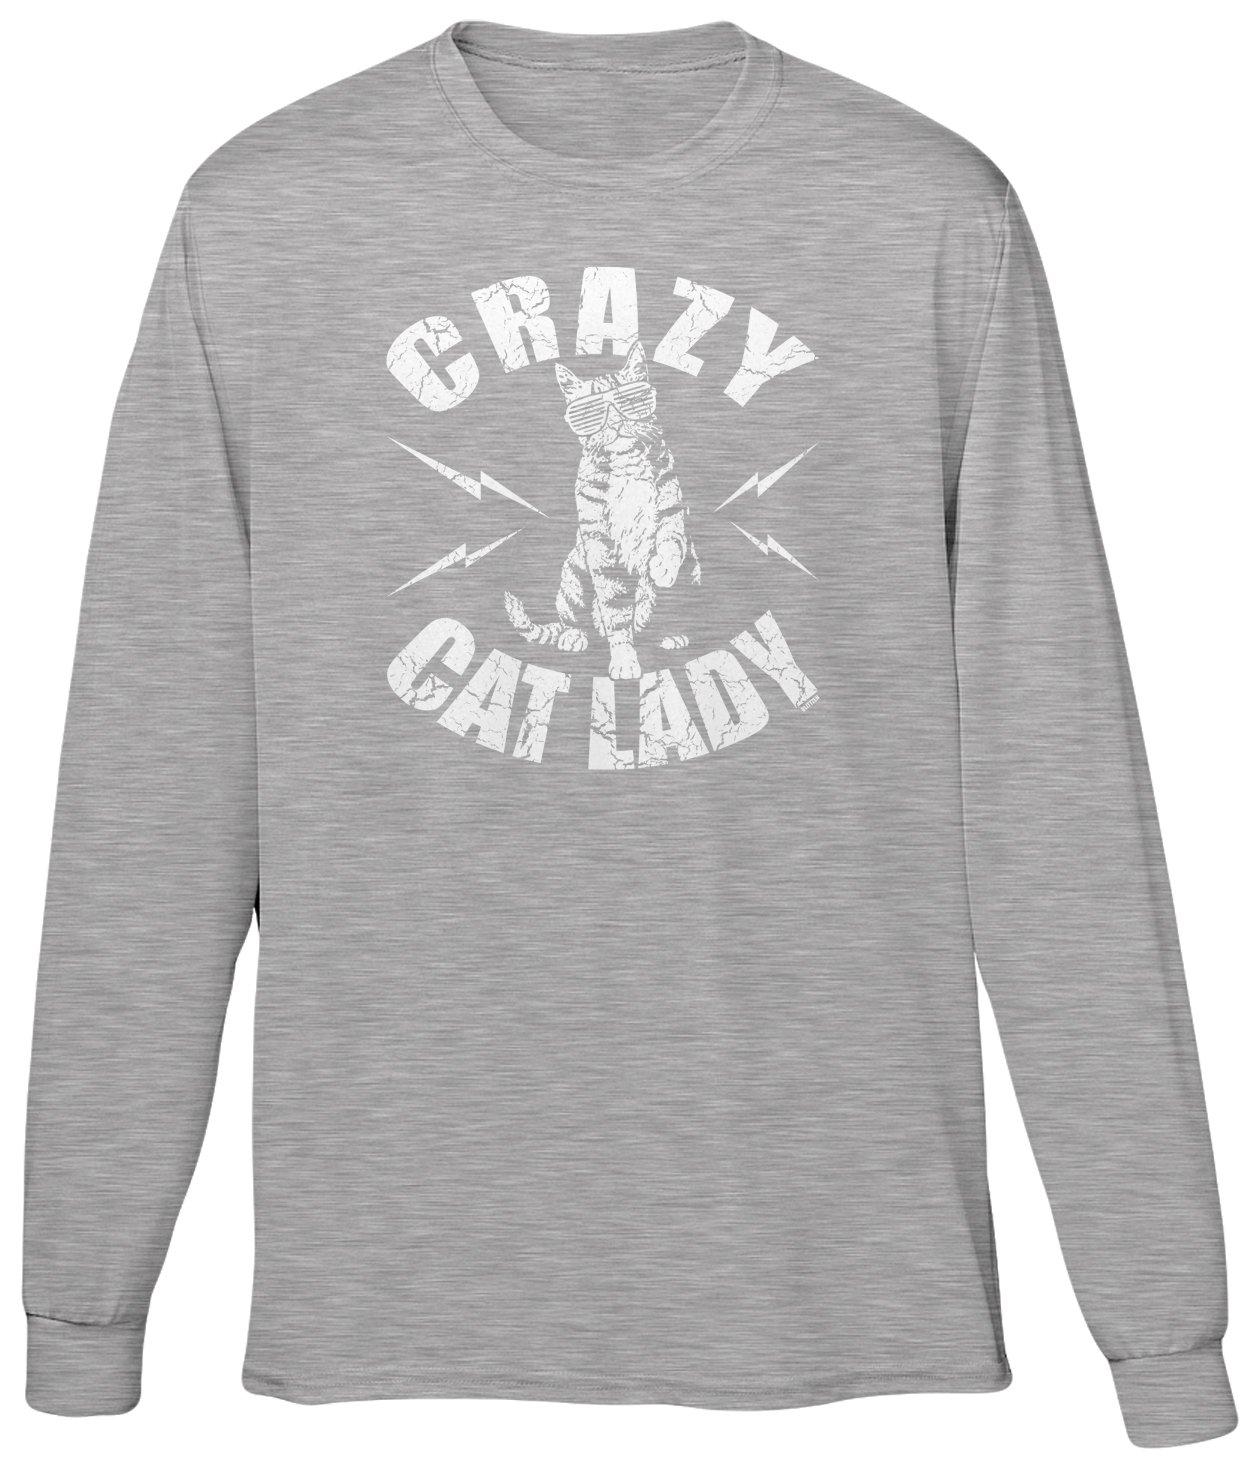 S T Shirt Crazy Cat Lady Cool Cat Mom 2068